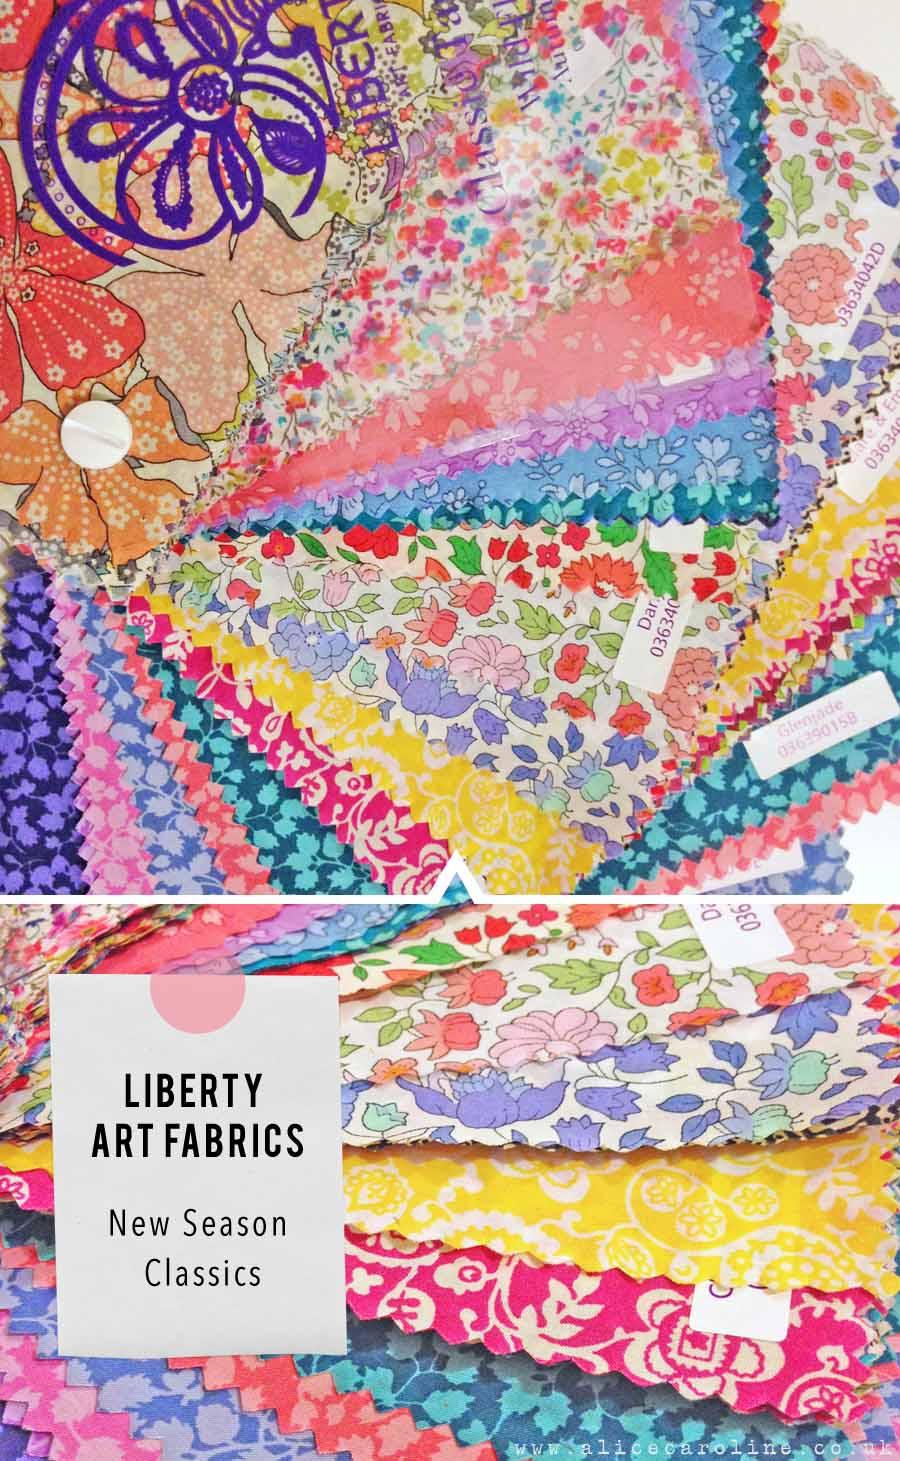 Liberty-fabrics-new-season-classics